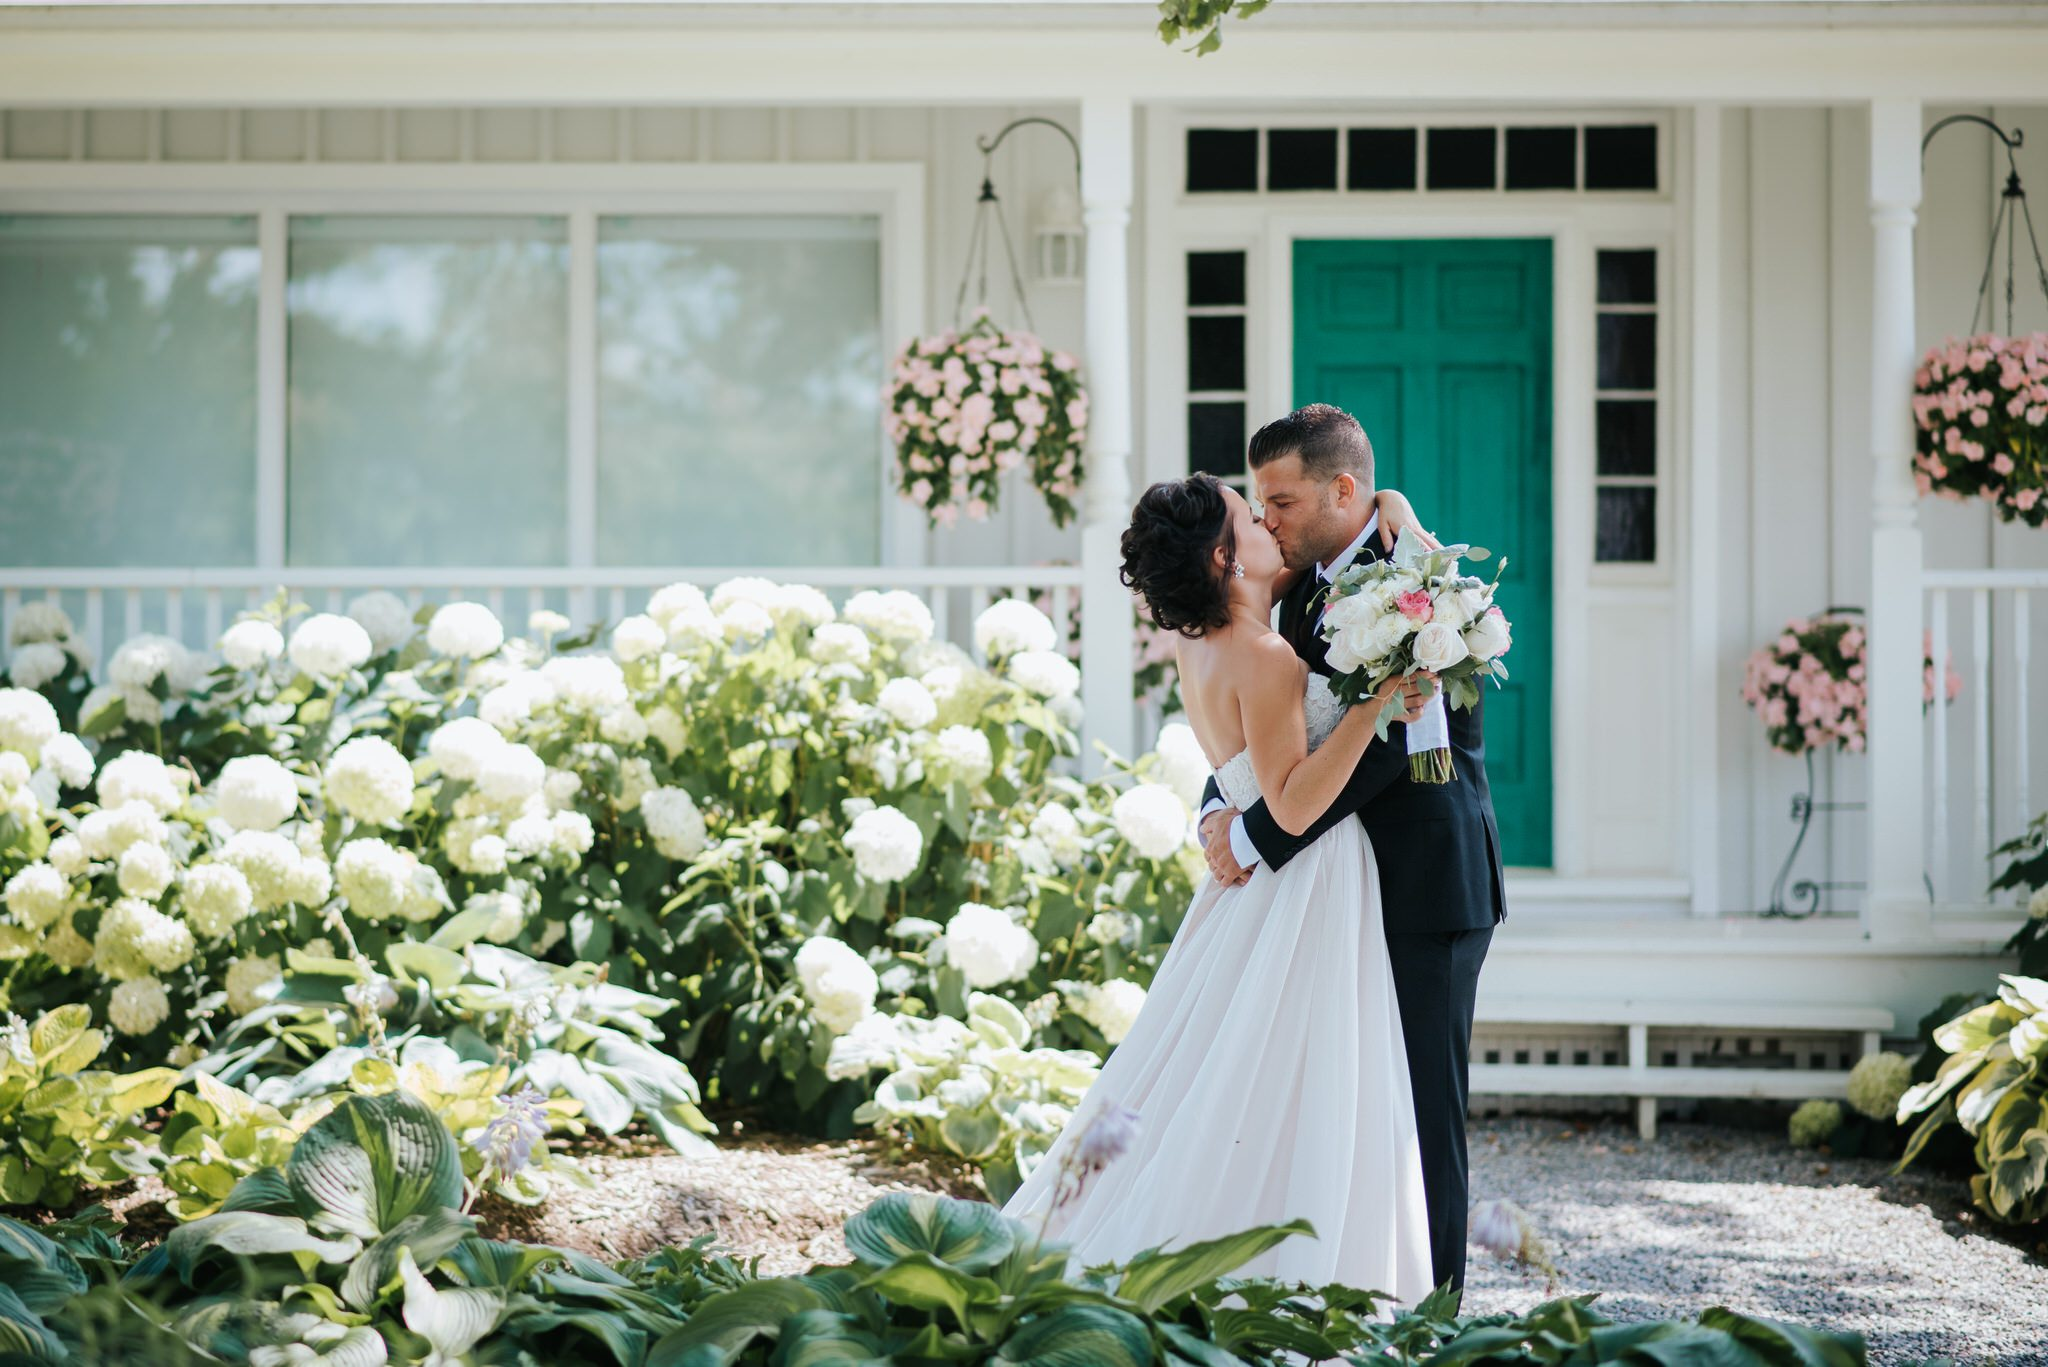 Bloomfield Gardens Wedding - first look kiss